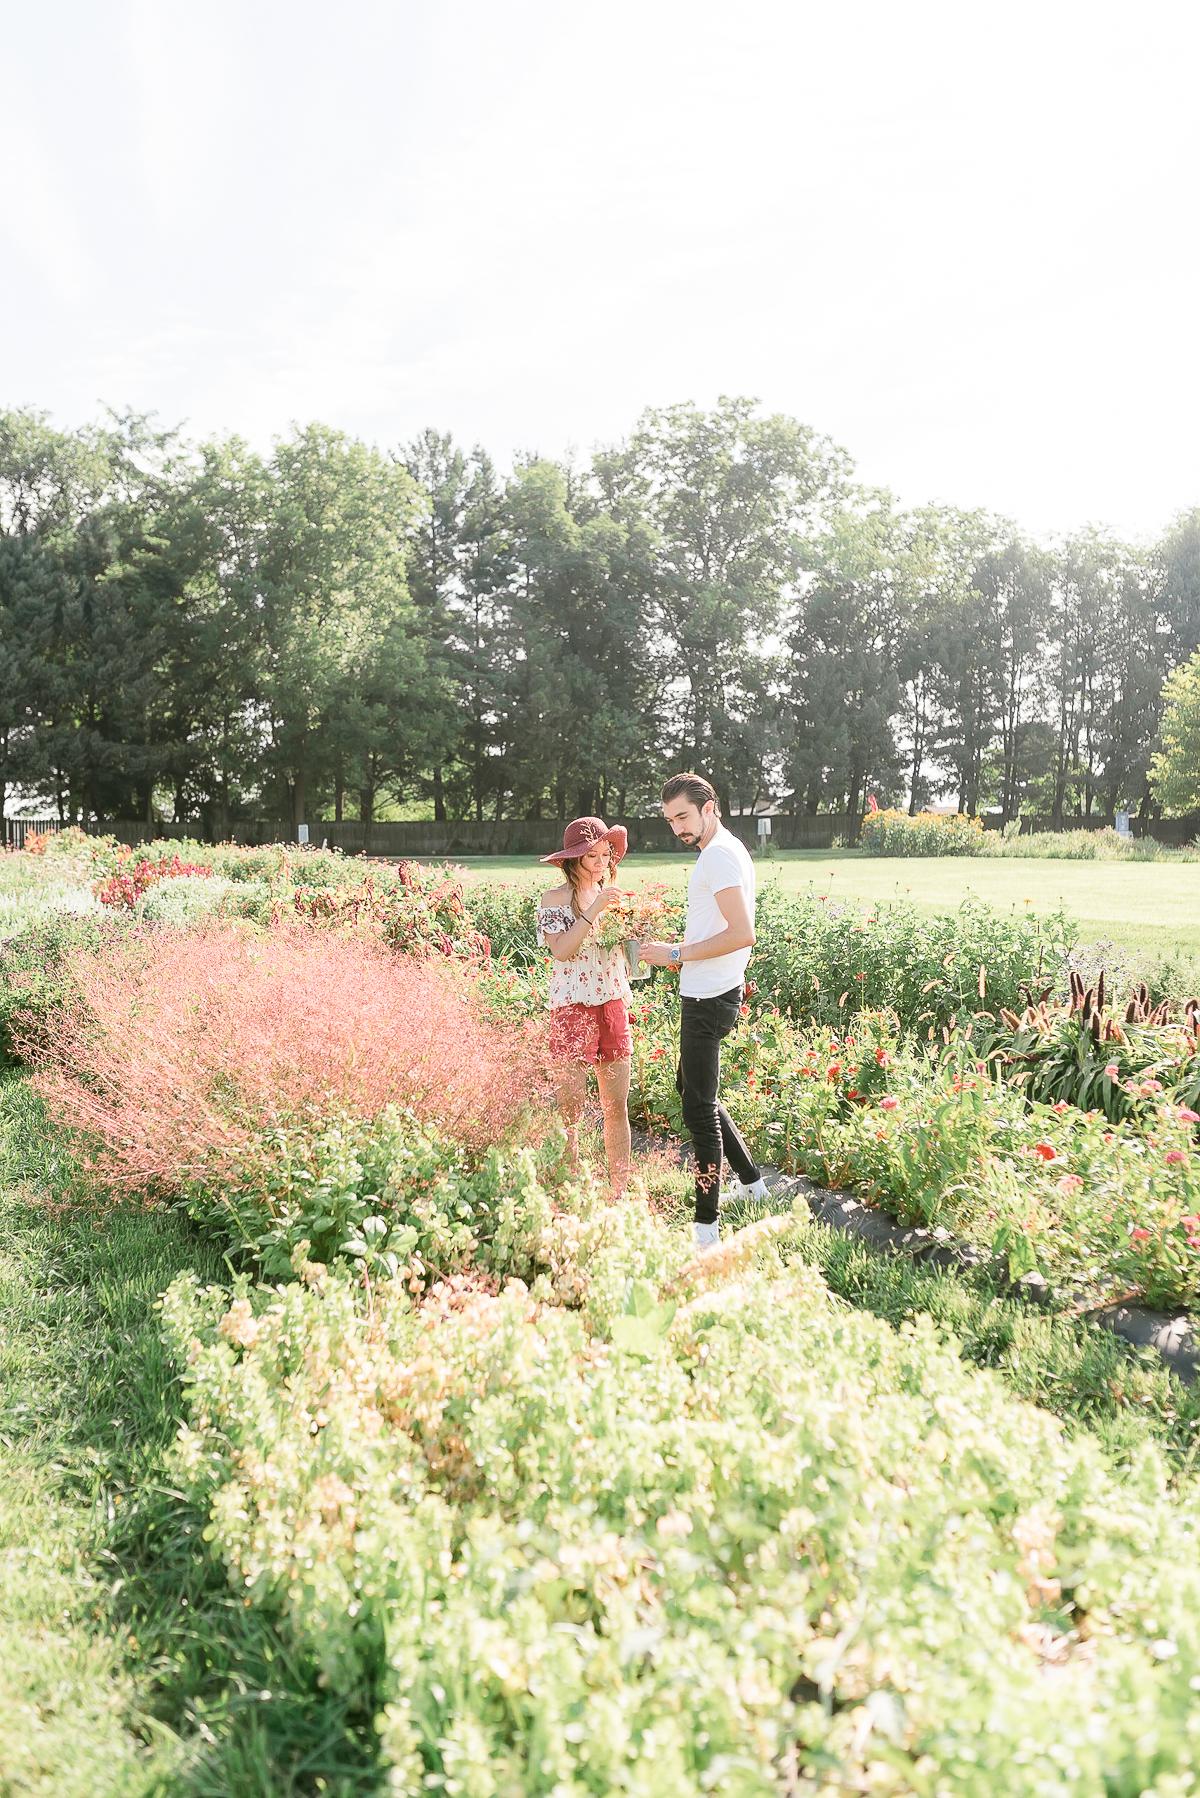 MD-Engagement-Larriland-Farm-Fruit-Picking-43.jpg